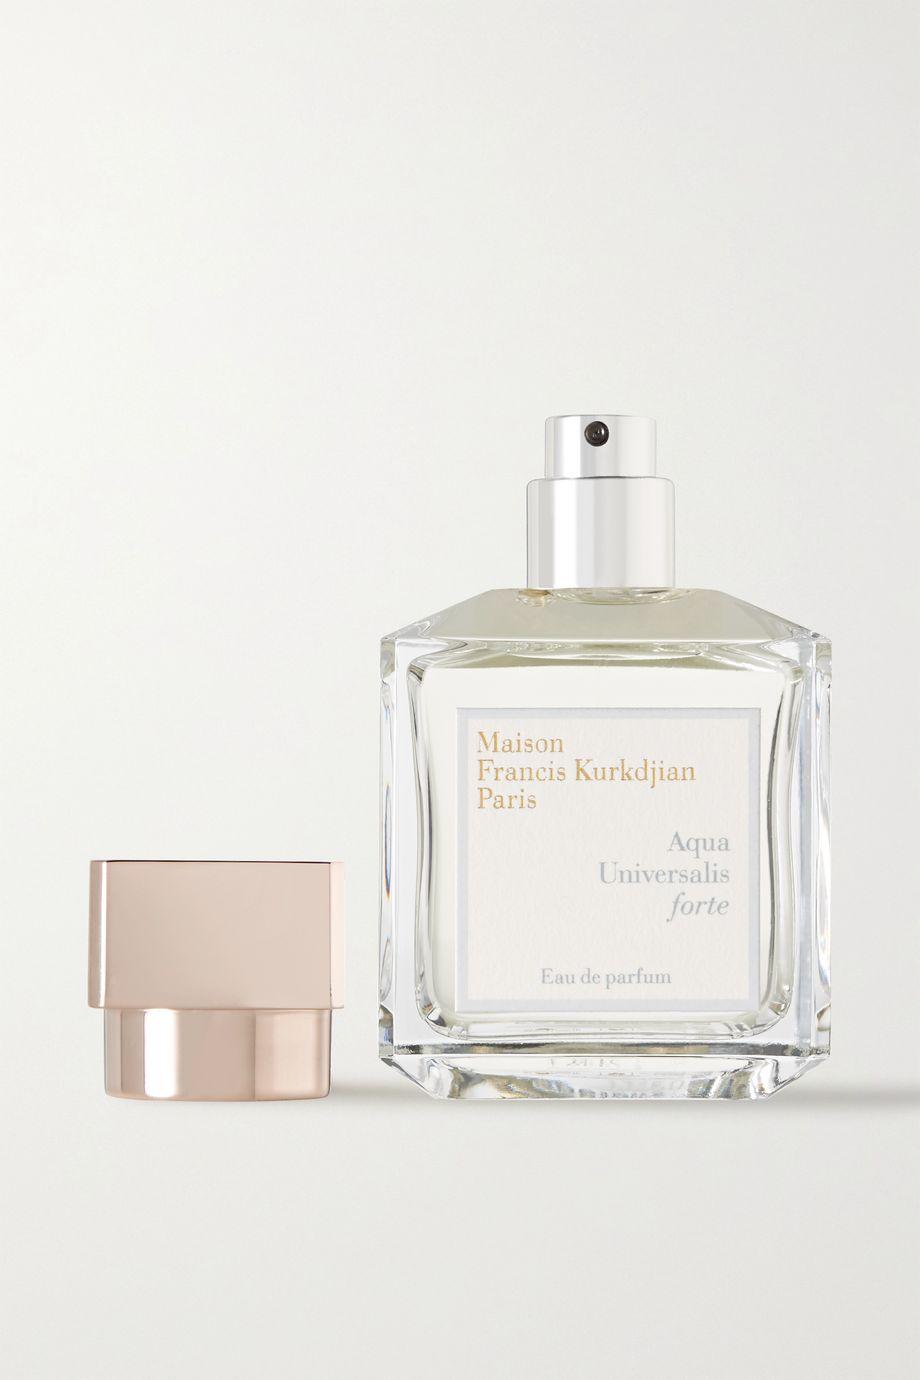 Maison Francis Kurkdjian Eau de Parfum - Aqua Universalis Forte, 70ml